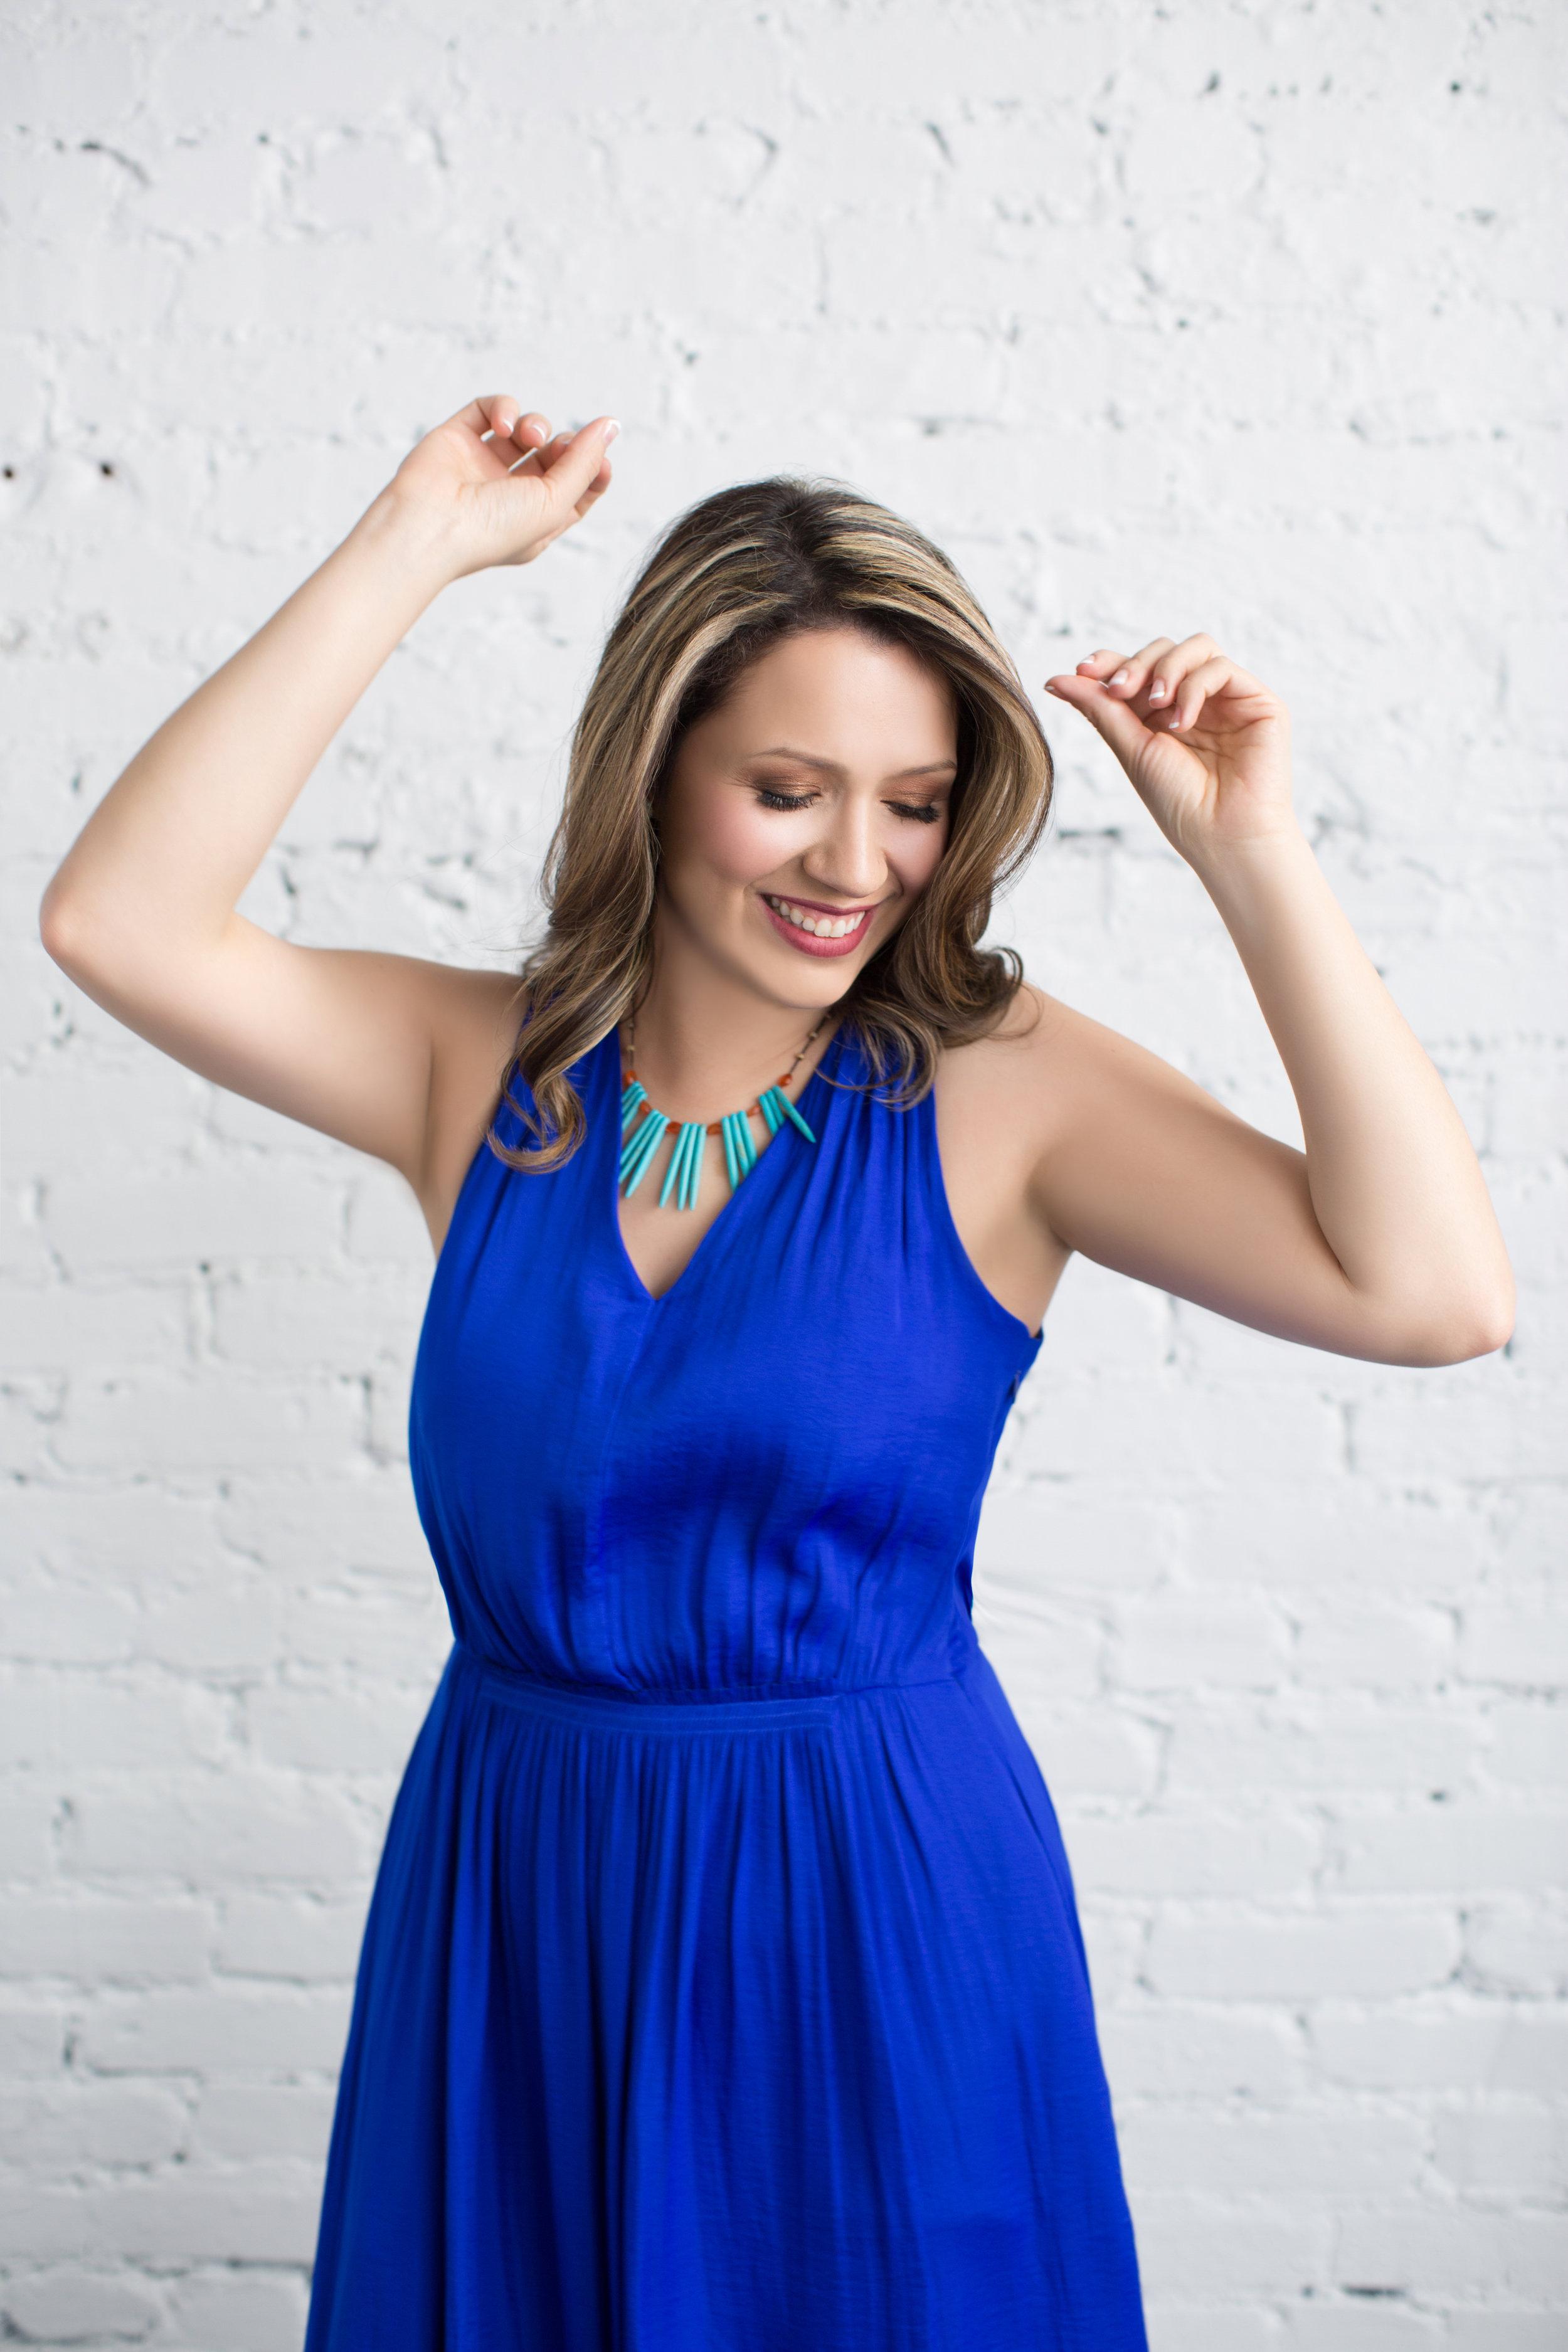 Stefanie Diaz - Founder, W.O.E. Women Only Entrepreneurs